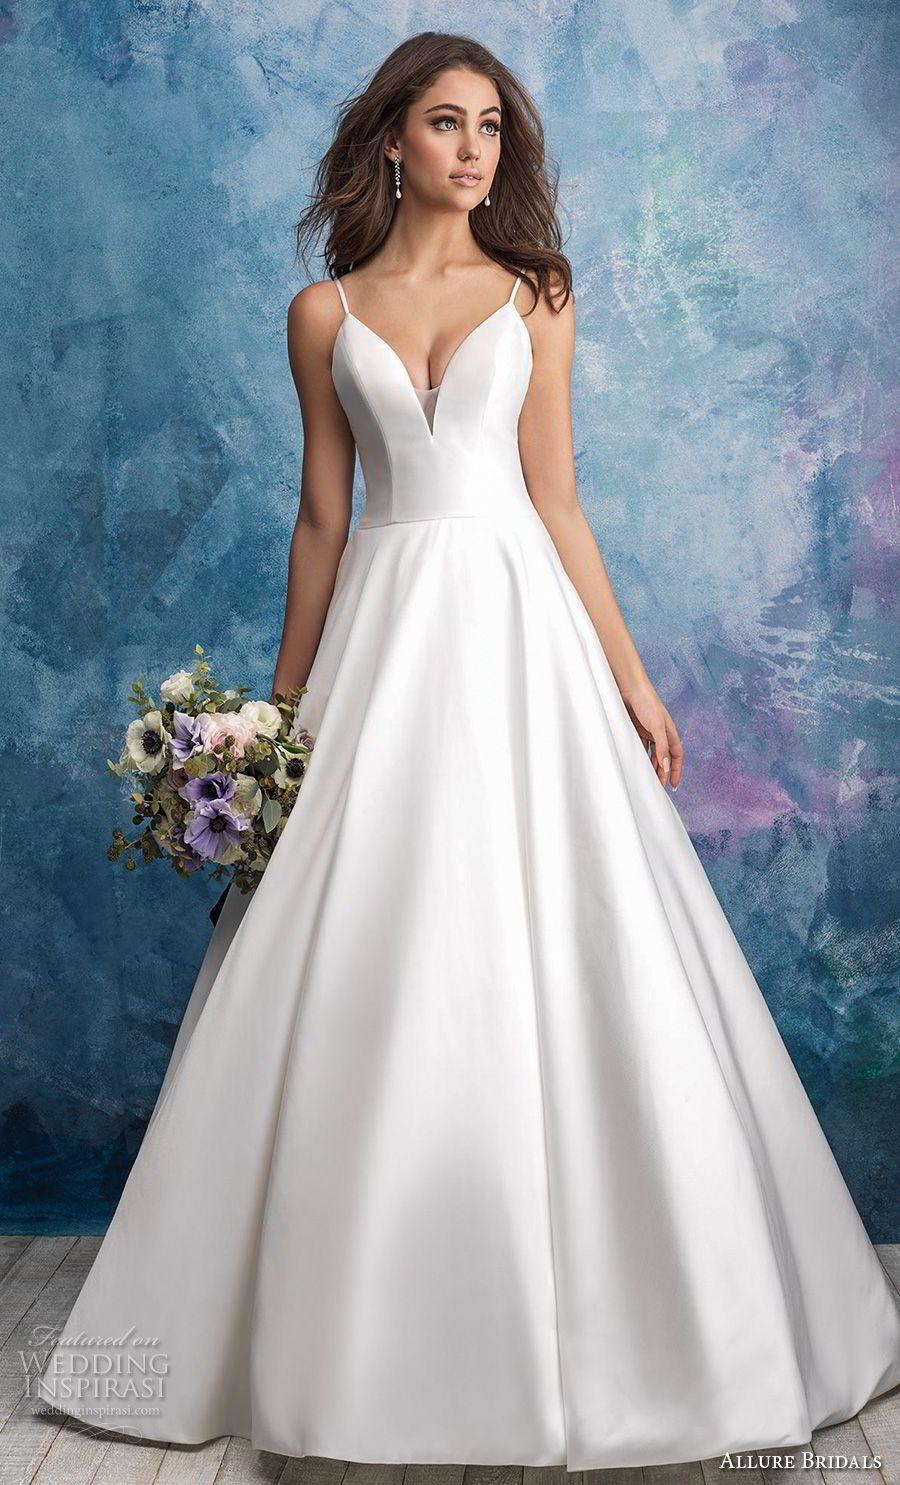 Allure Bridals Fall 2018 Wedding Dresses Wedding Inspirasi Allure Bridal Wedding Dress Allure Wedding Dresses Allure Bridal [ 1485 x 900 Pixel ]